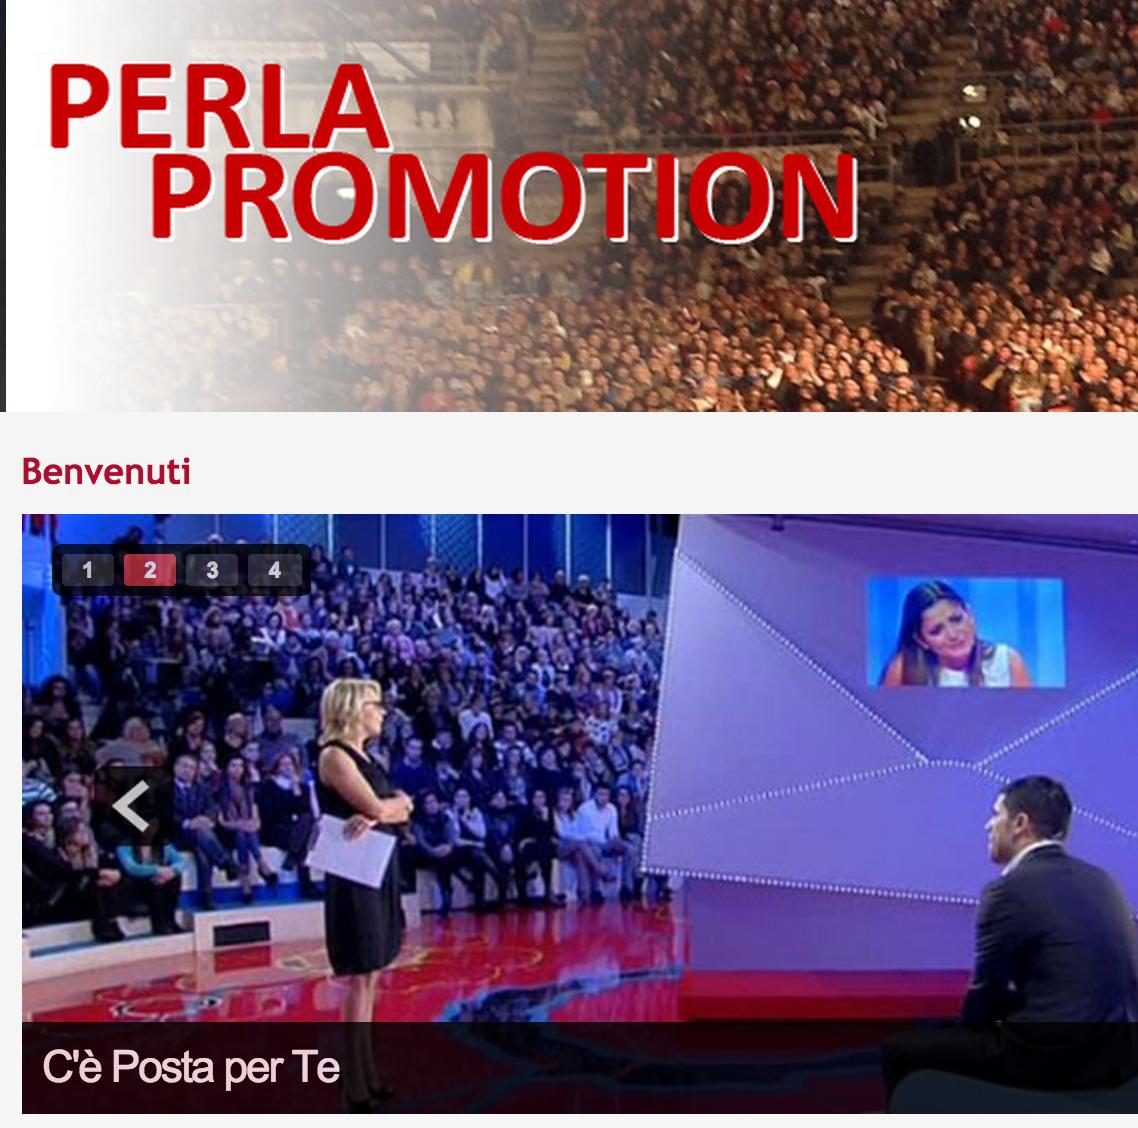 Perla Promotion